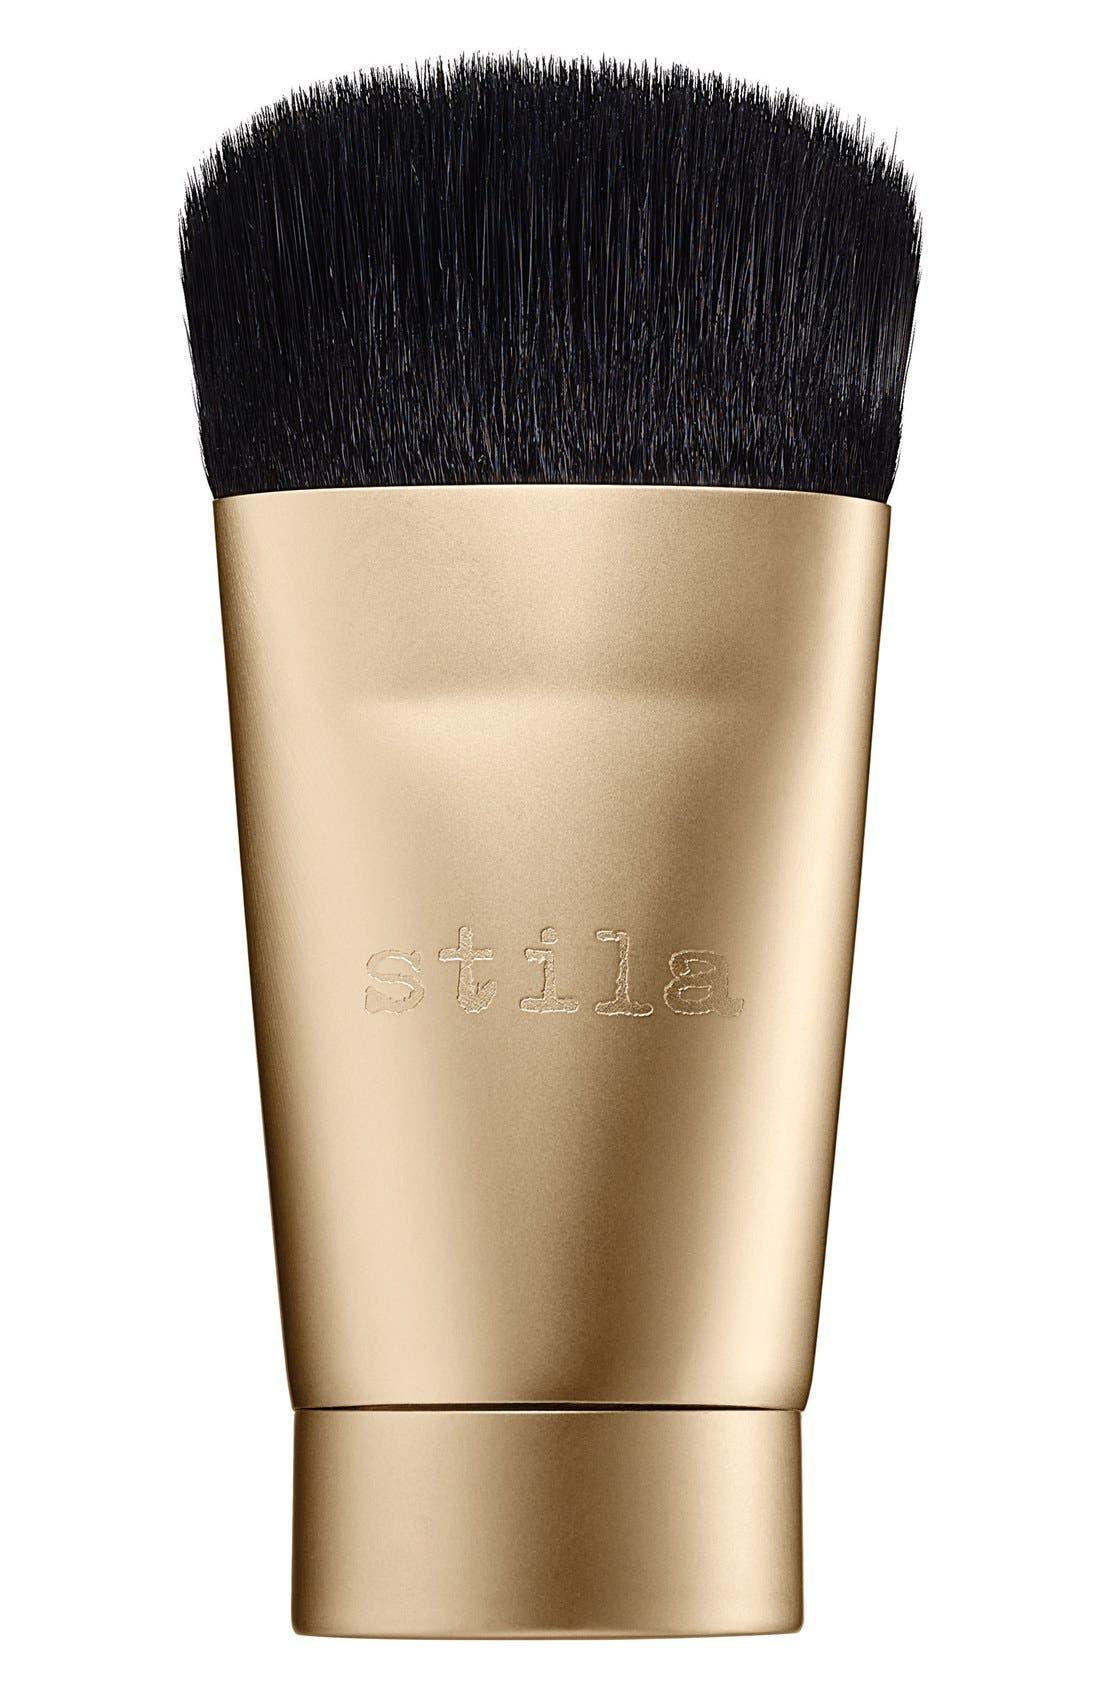 stila 'wonder brush' face & body brush